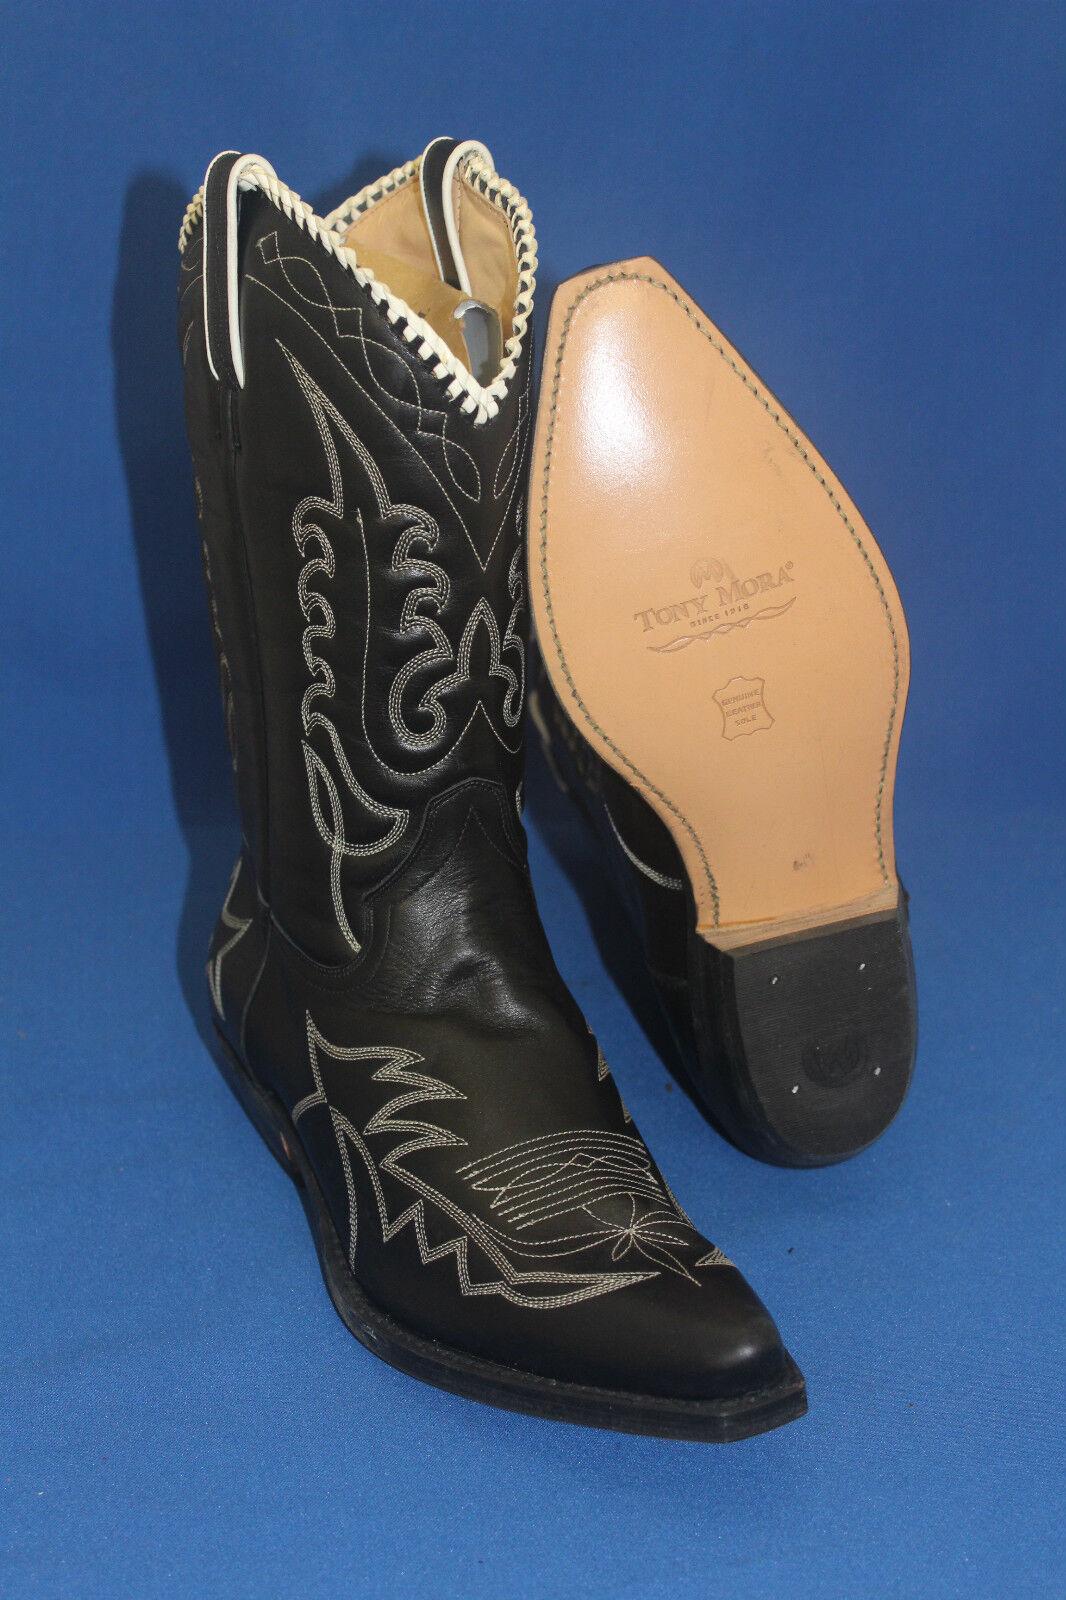 Tony Tony Tony mora Stivali Stivali Odeon Stivali Western Cowboy Stivali Taglia. 40 Pelle Nuovo a5326f